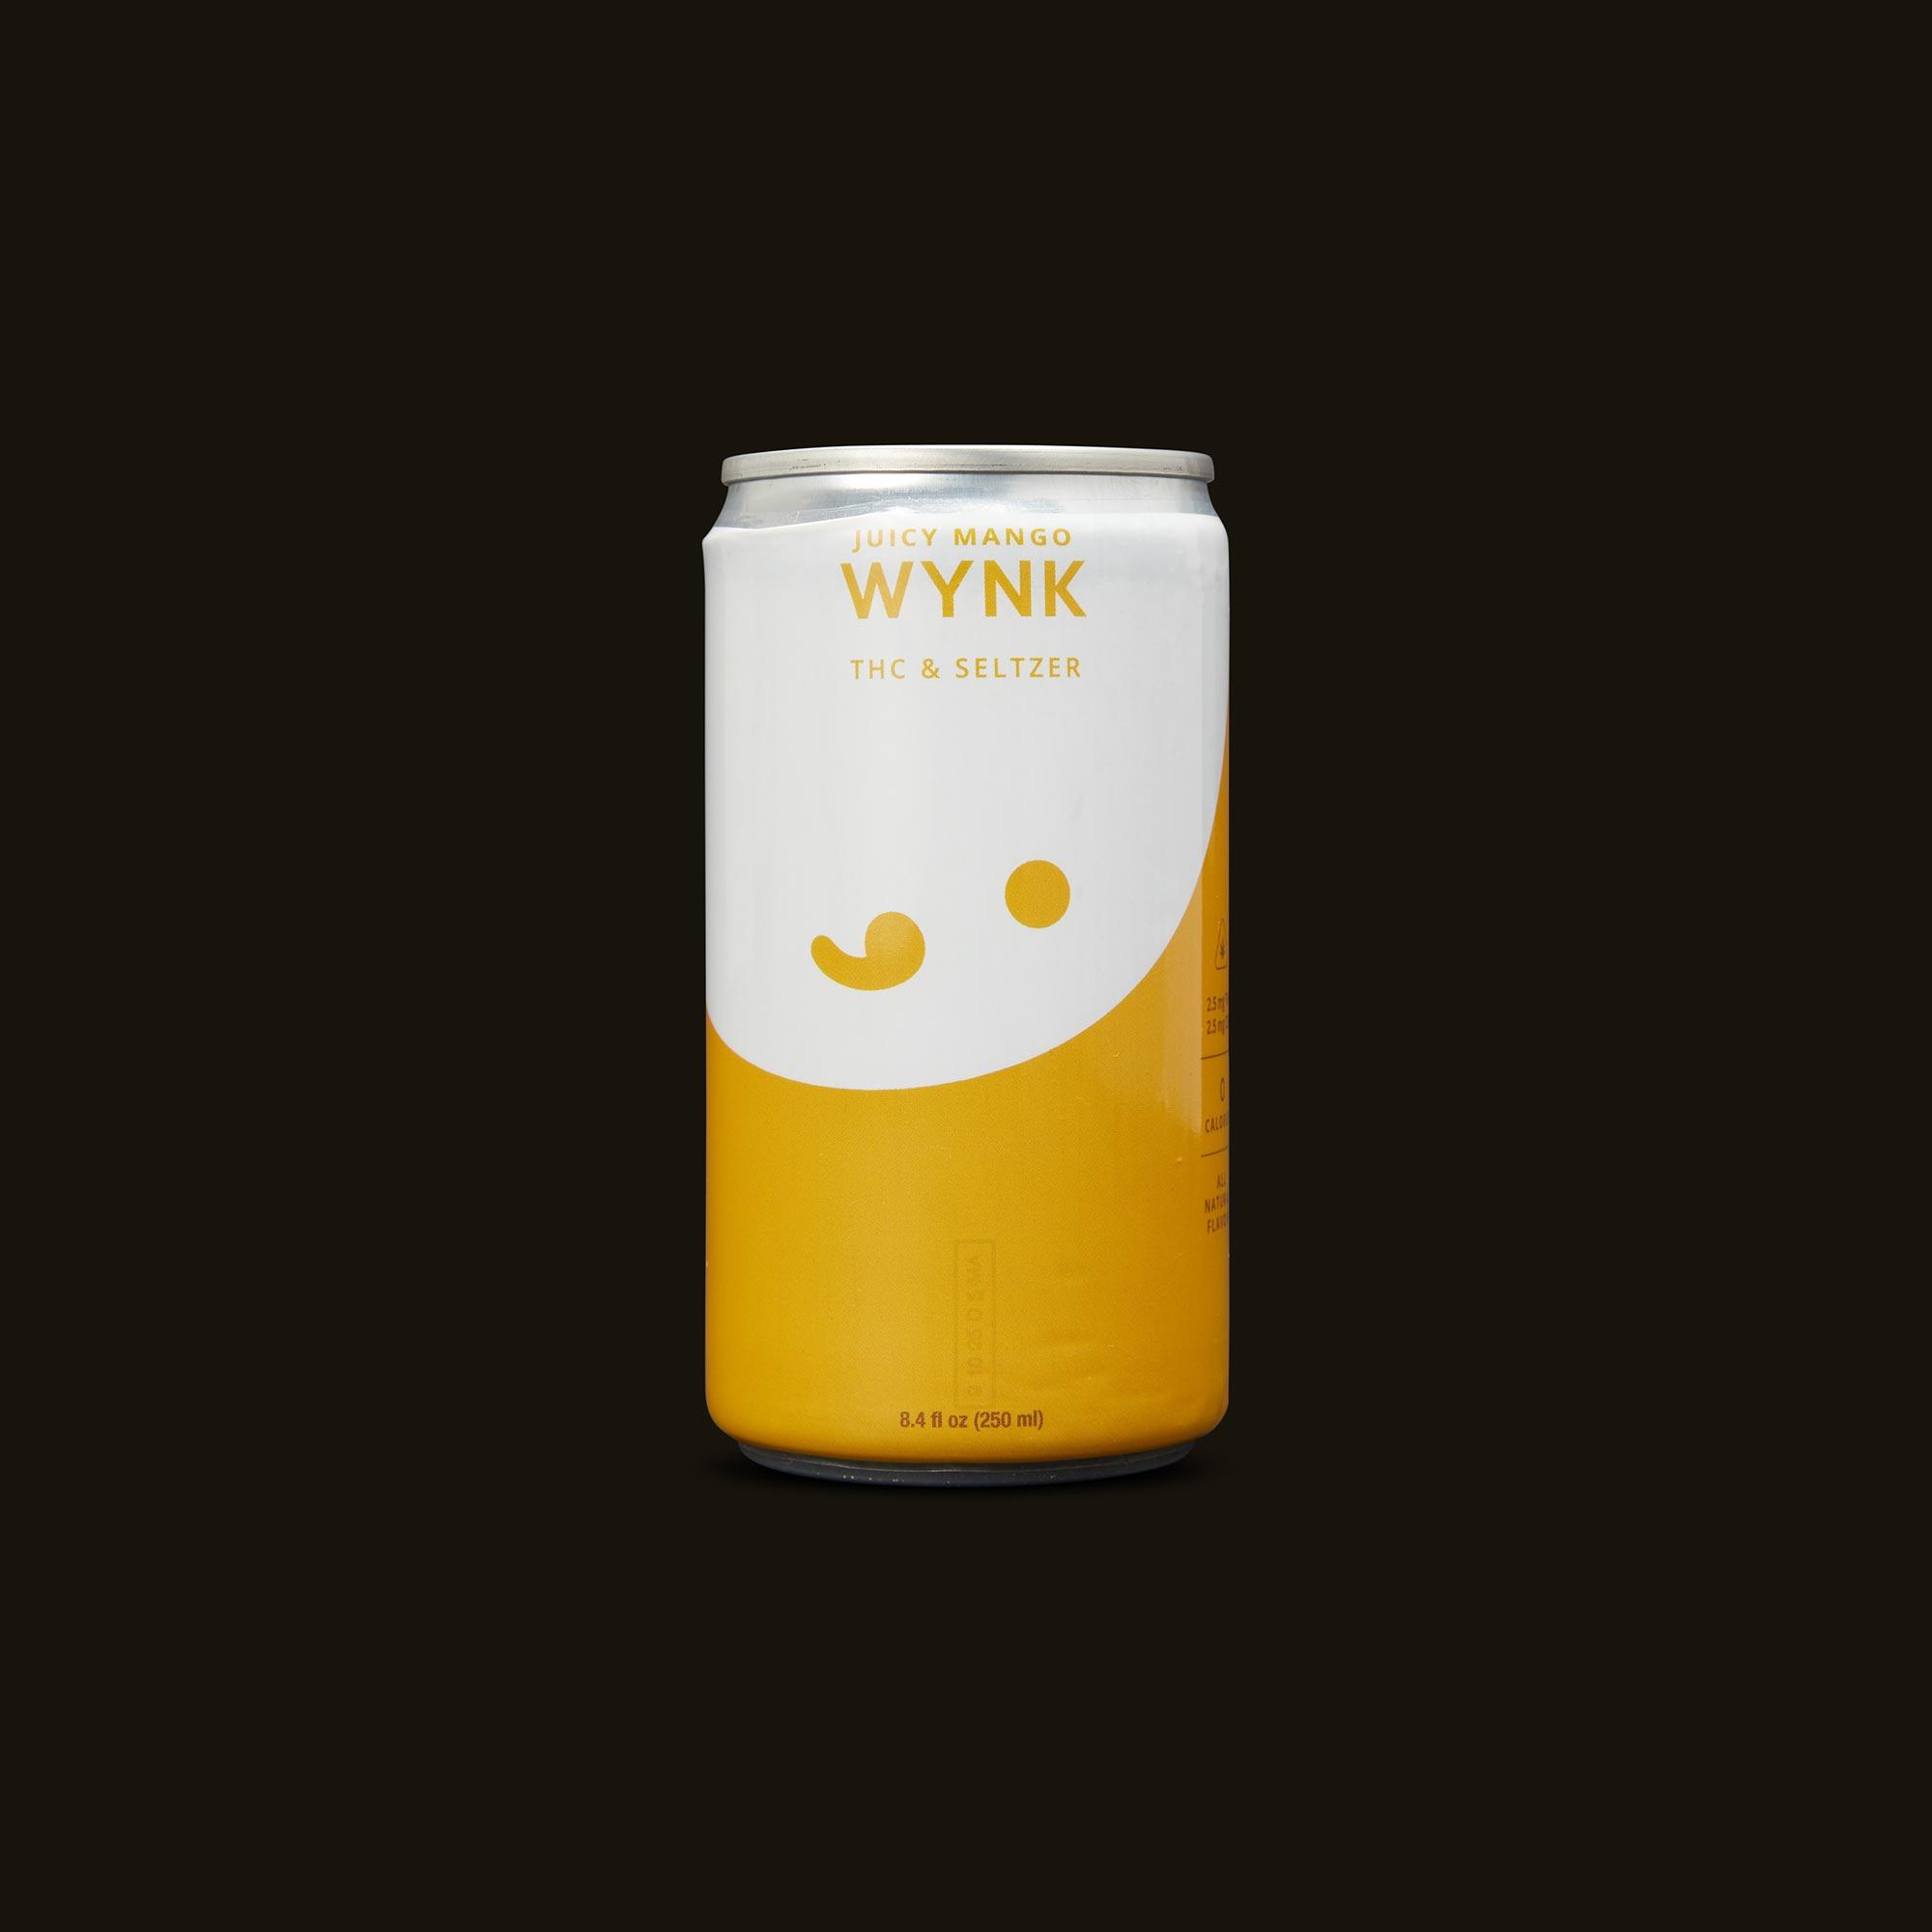 Juicy Mango Seltzer - One 8.4fl oz can (2.5mg THC, 2.5mg CBD)